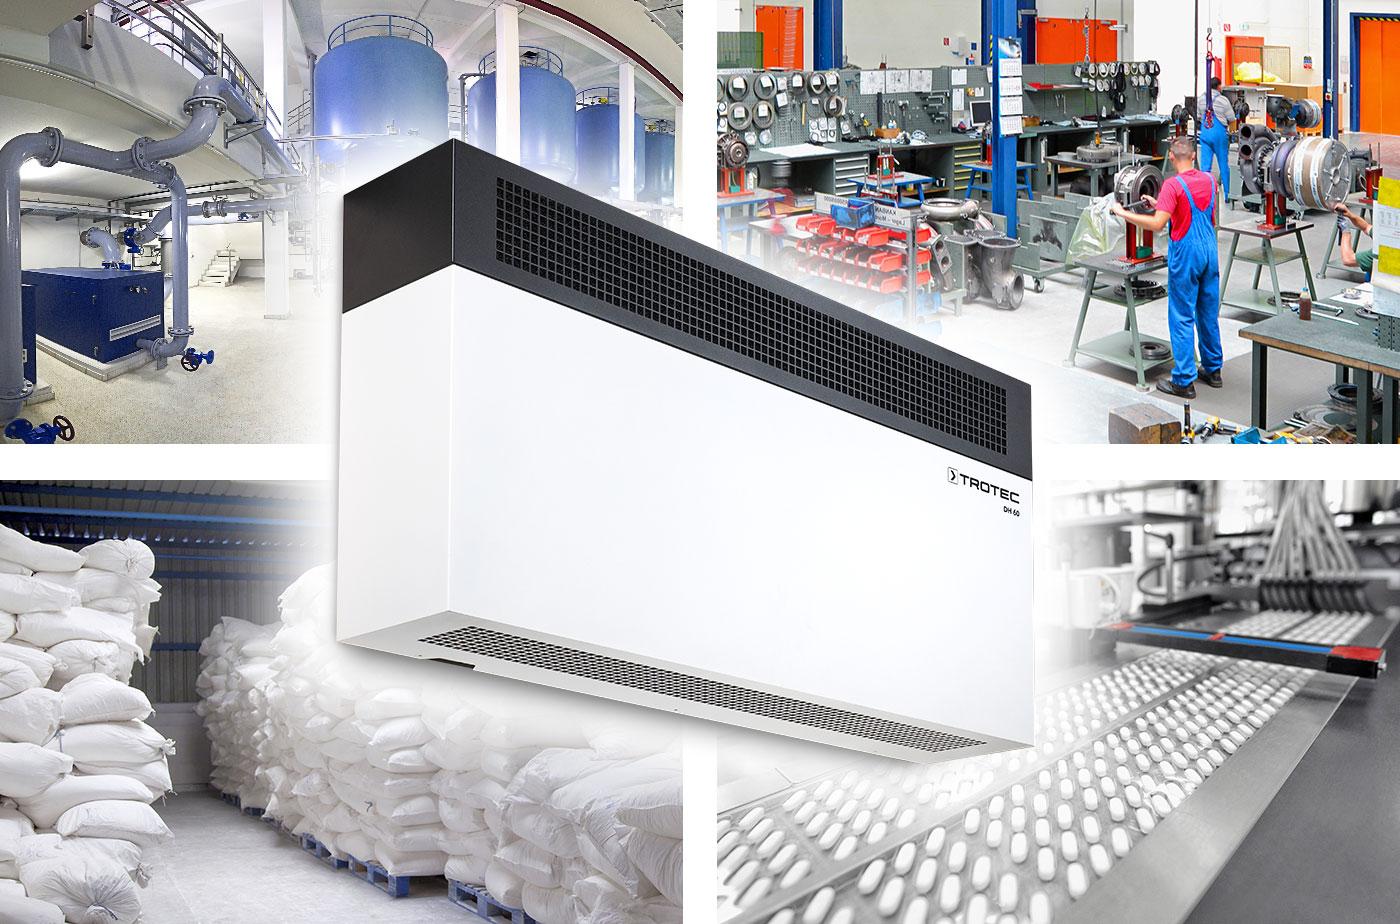 Un deshumidificador ideal para múltiples aplicaciones: el DH 60 de Trotec